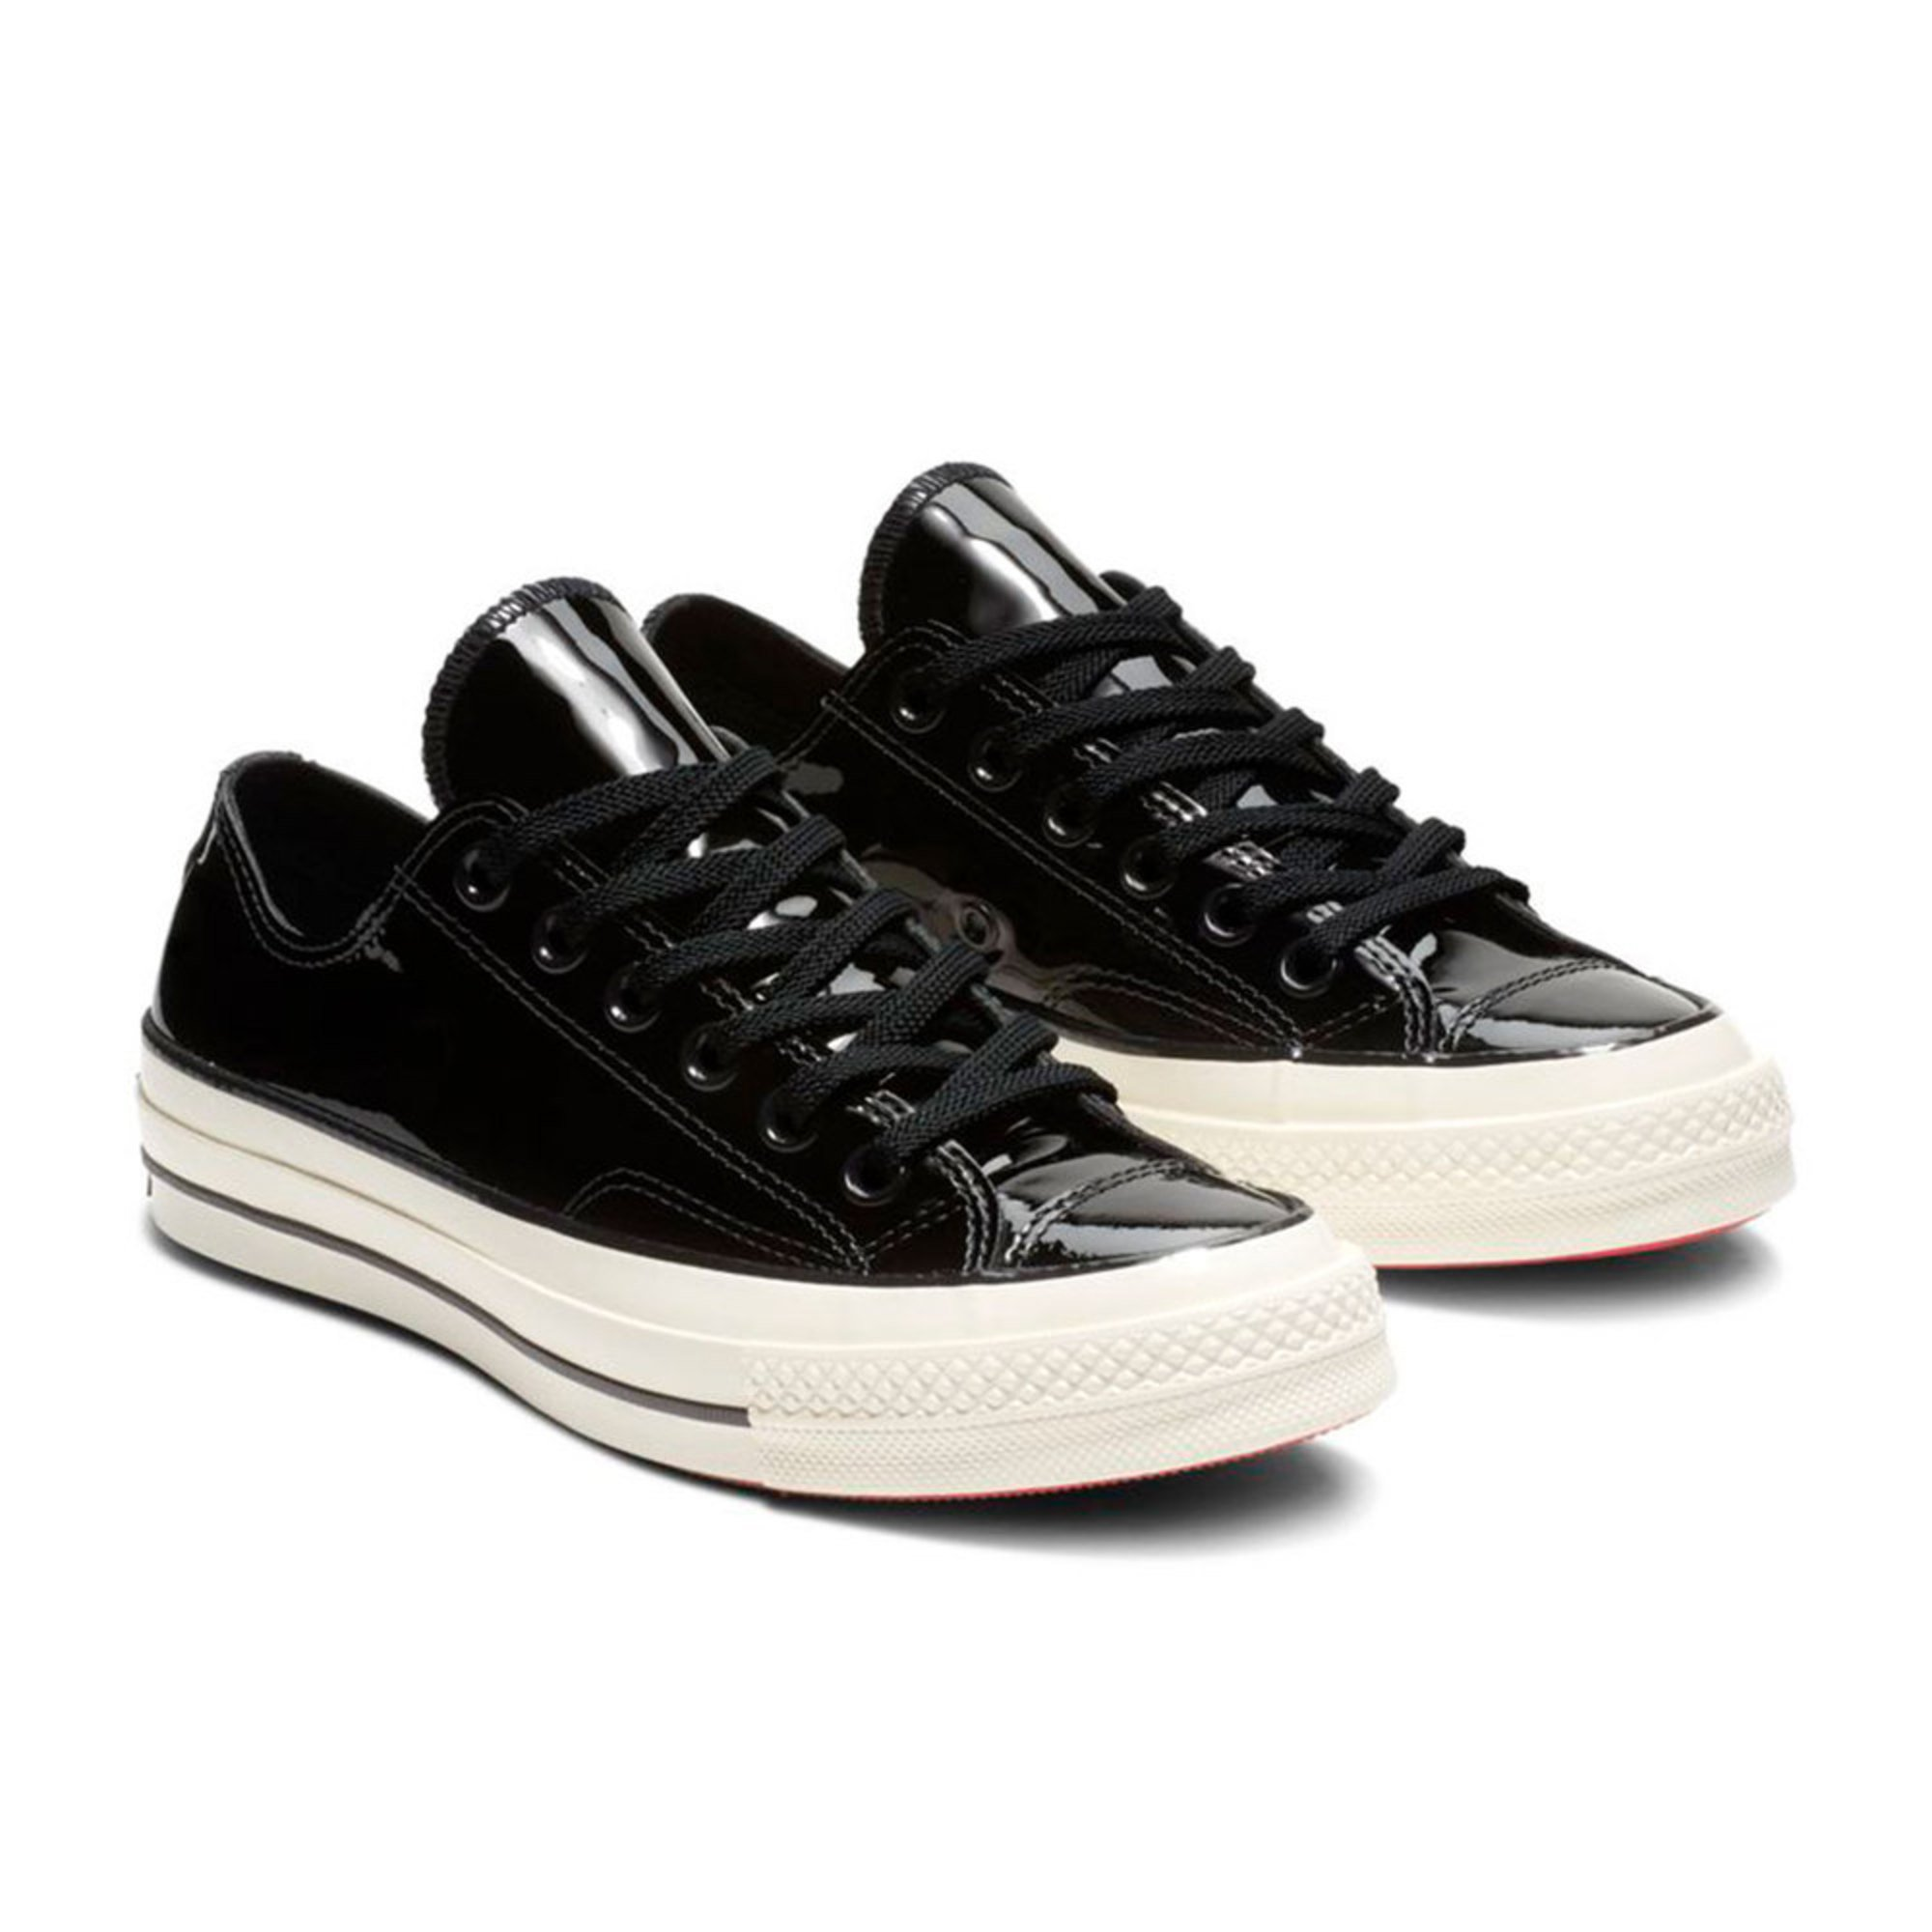 70530fc290a7 Converse. Converse Women s Chuck 70 Sneaker